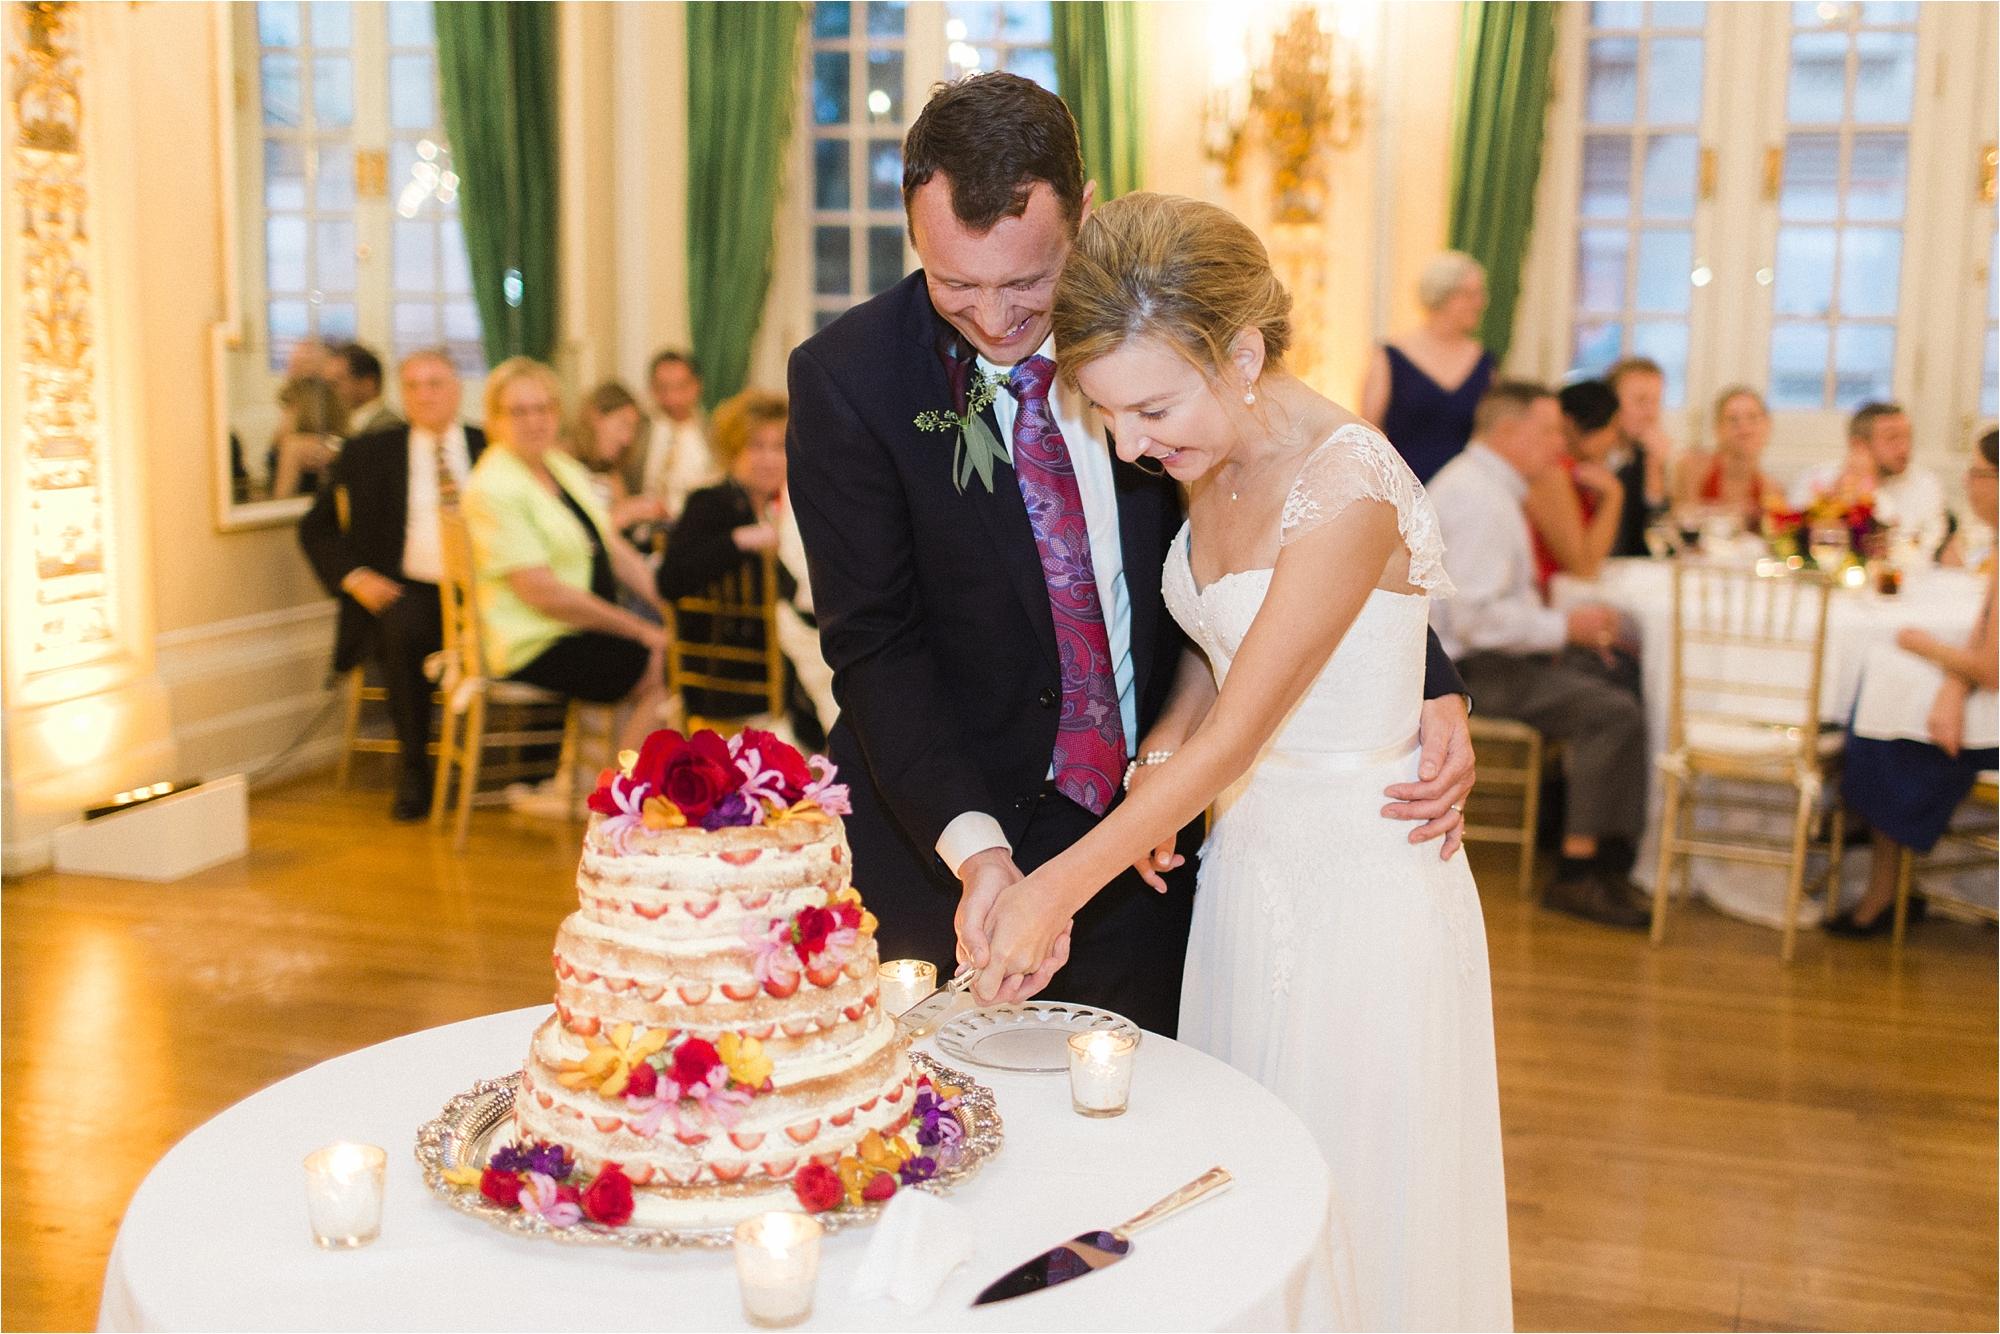 stephanie-yonce-photography-elegant-private-club-washington-dc-wedding-photos_0054.jpg